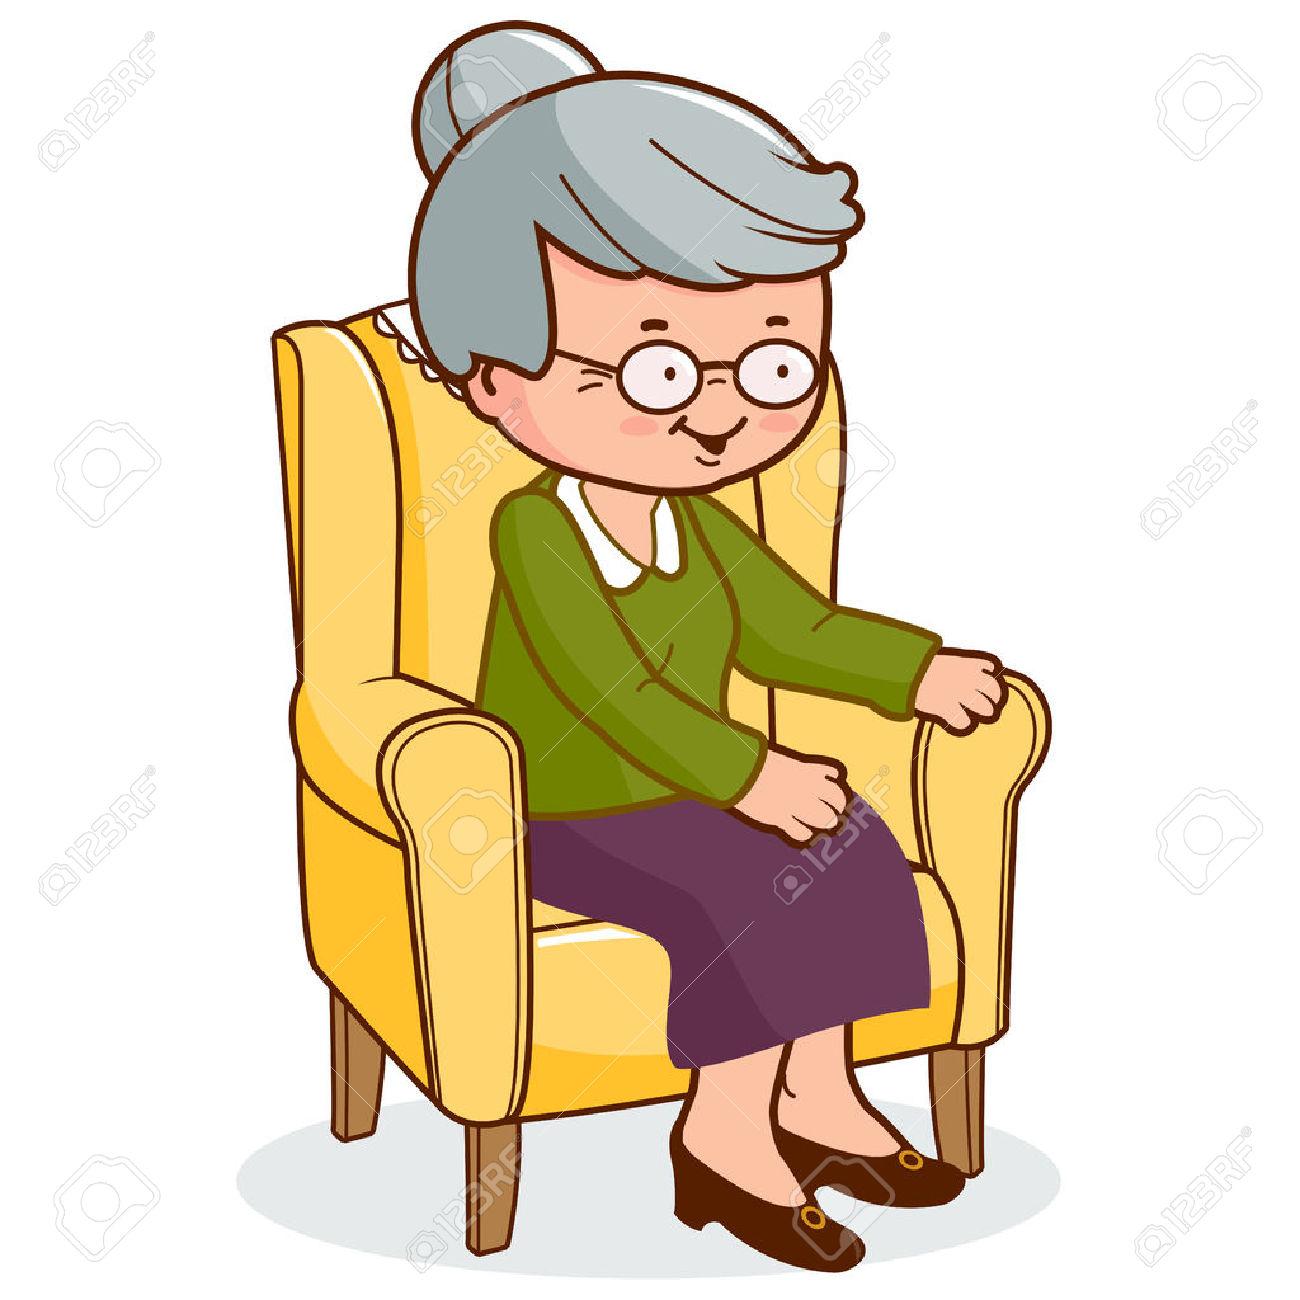 1300x1300 Grandma Clipart, Suggestions For Grandma Clipart, Download Grandma